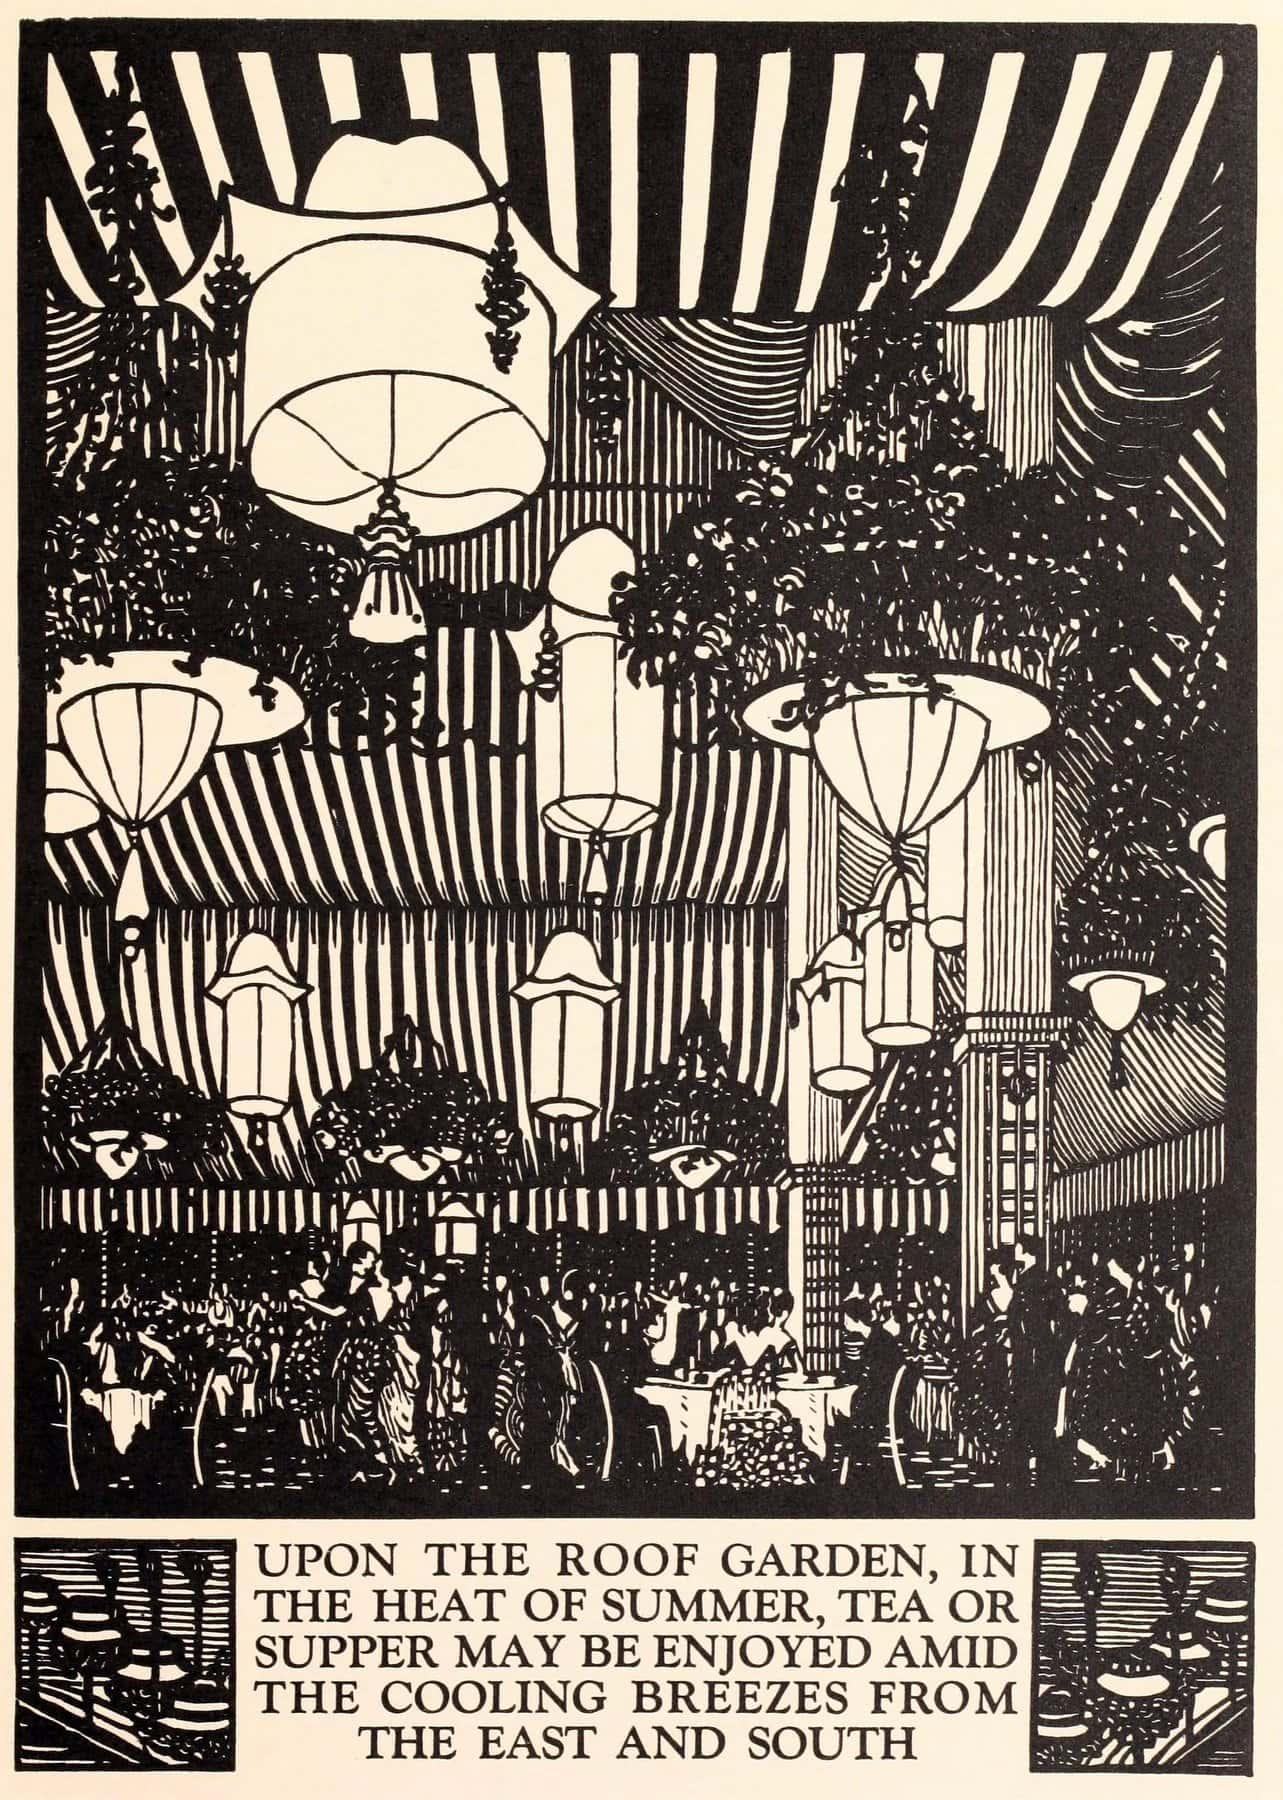 The Ritz-Carlton Hotel booklet from 1919 (7) - ClickAmericana com